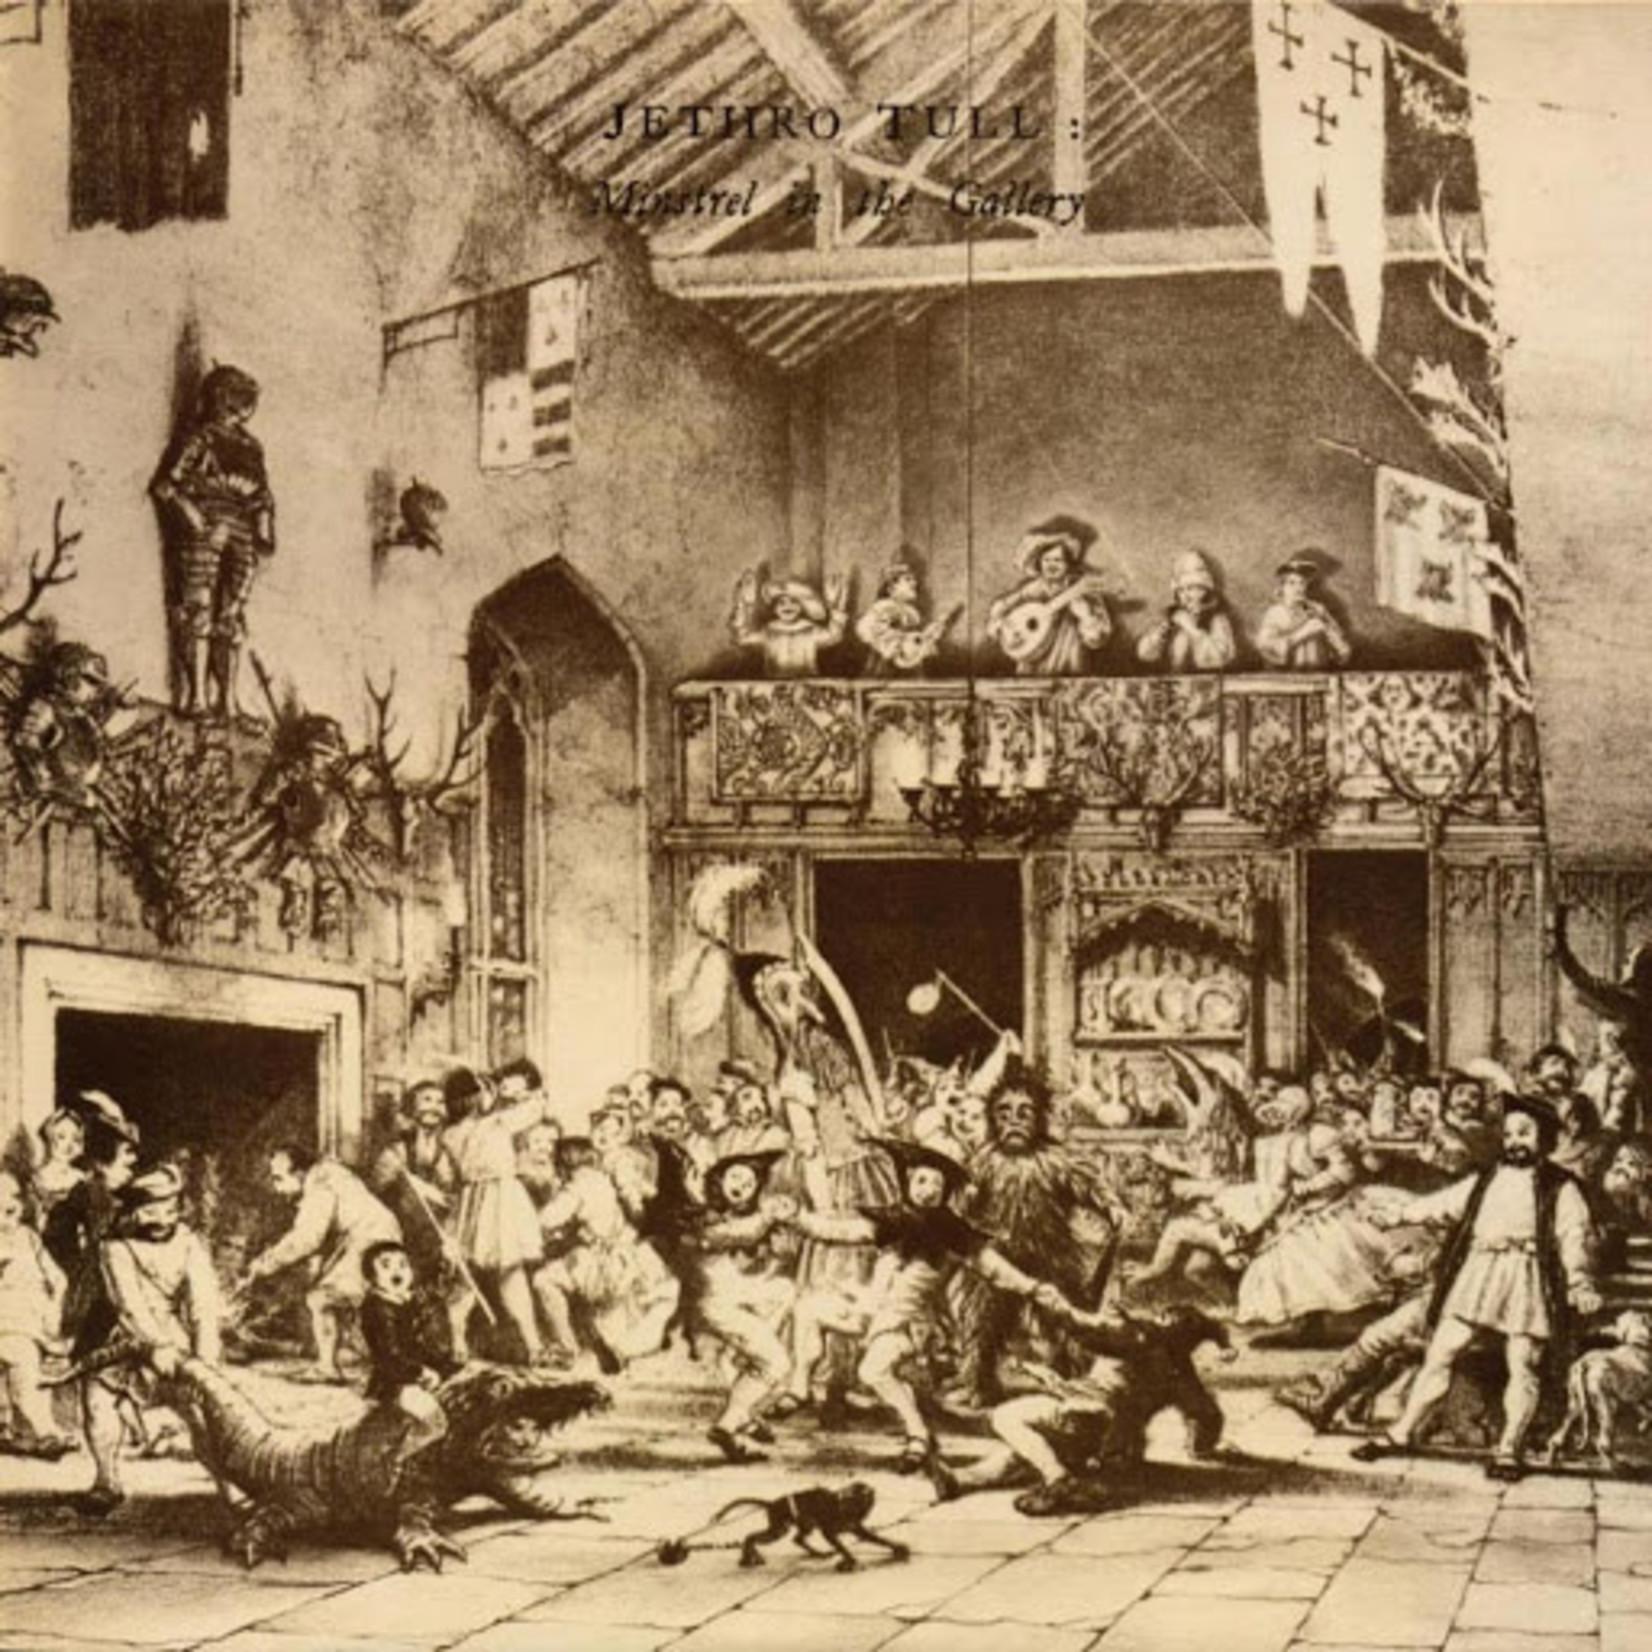 [Vintage] Jethro Tull: Minstrel in the Gallery